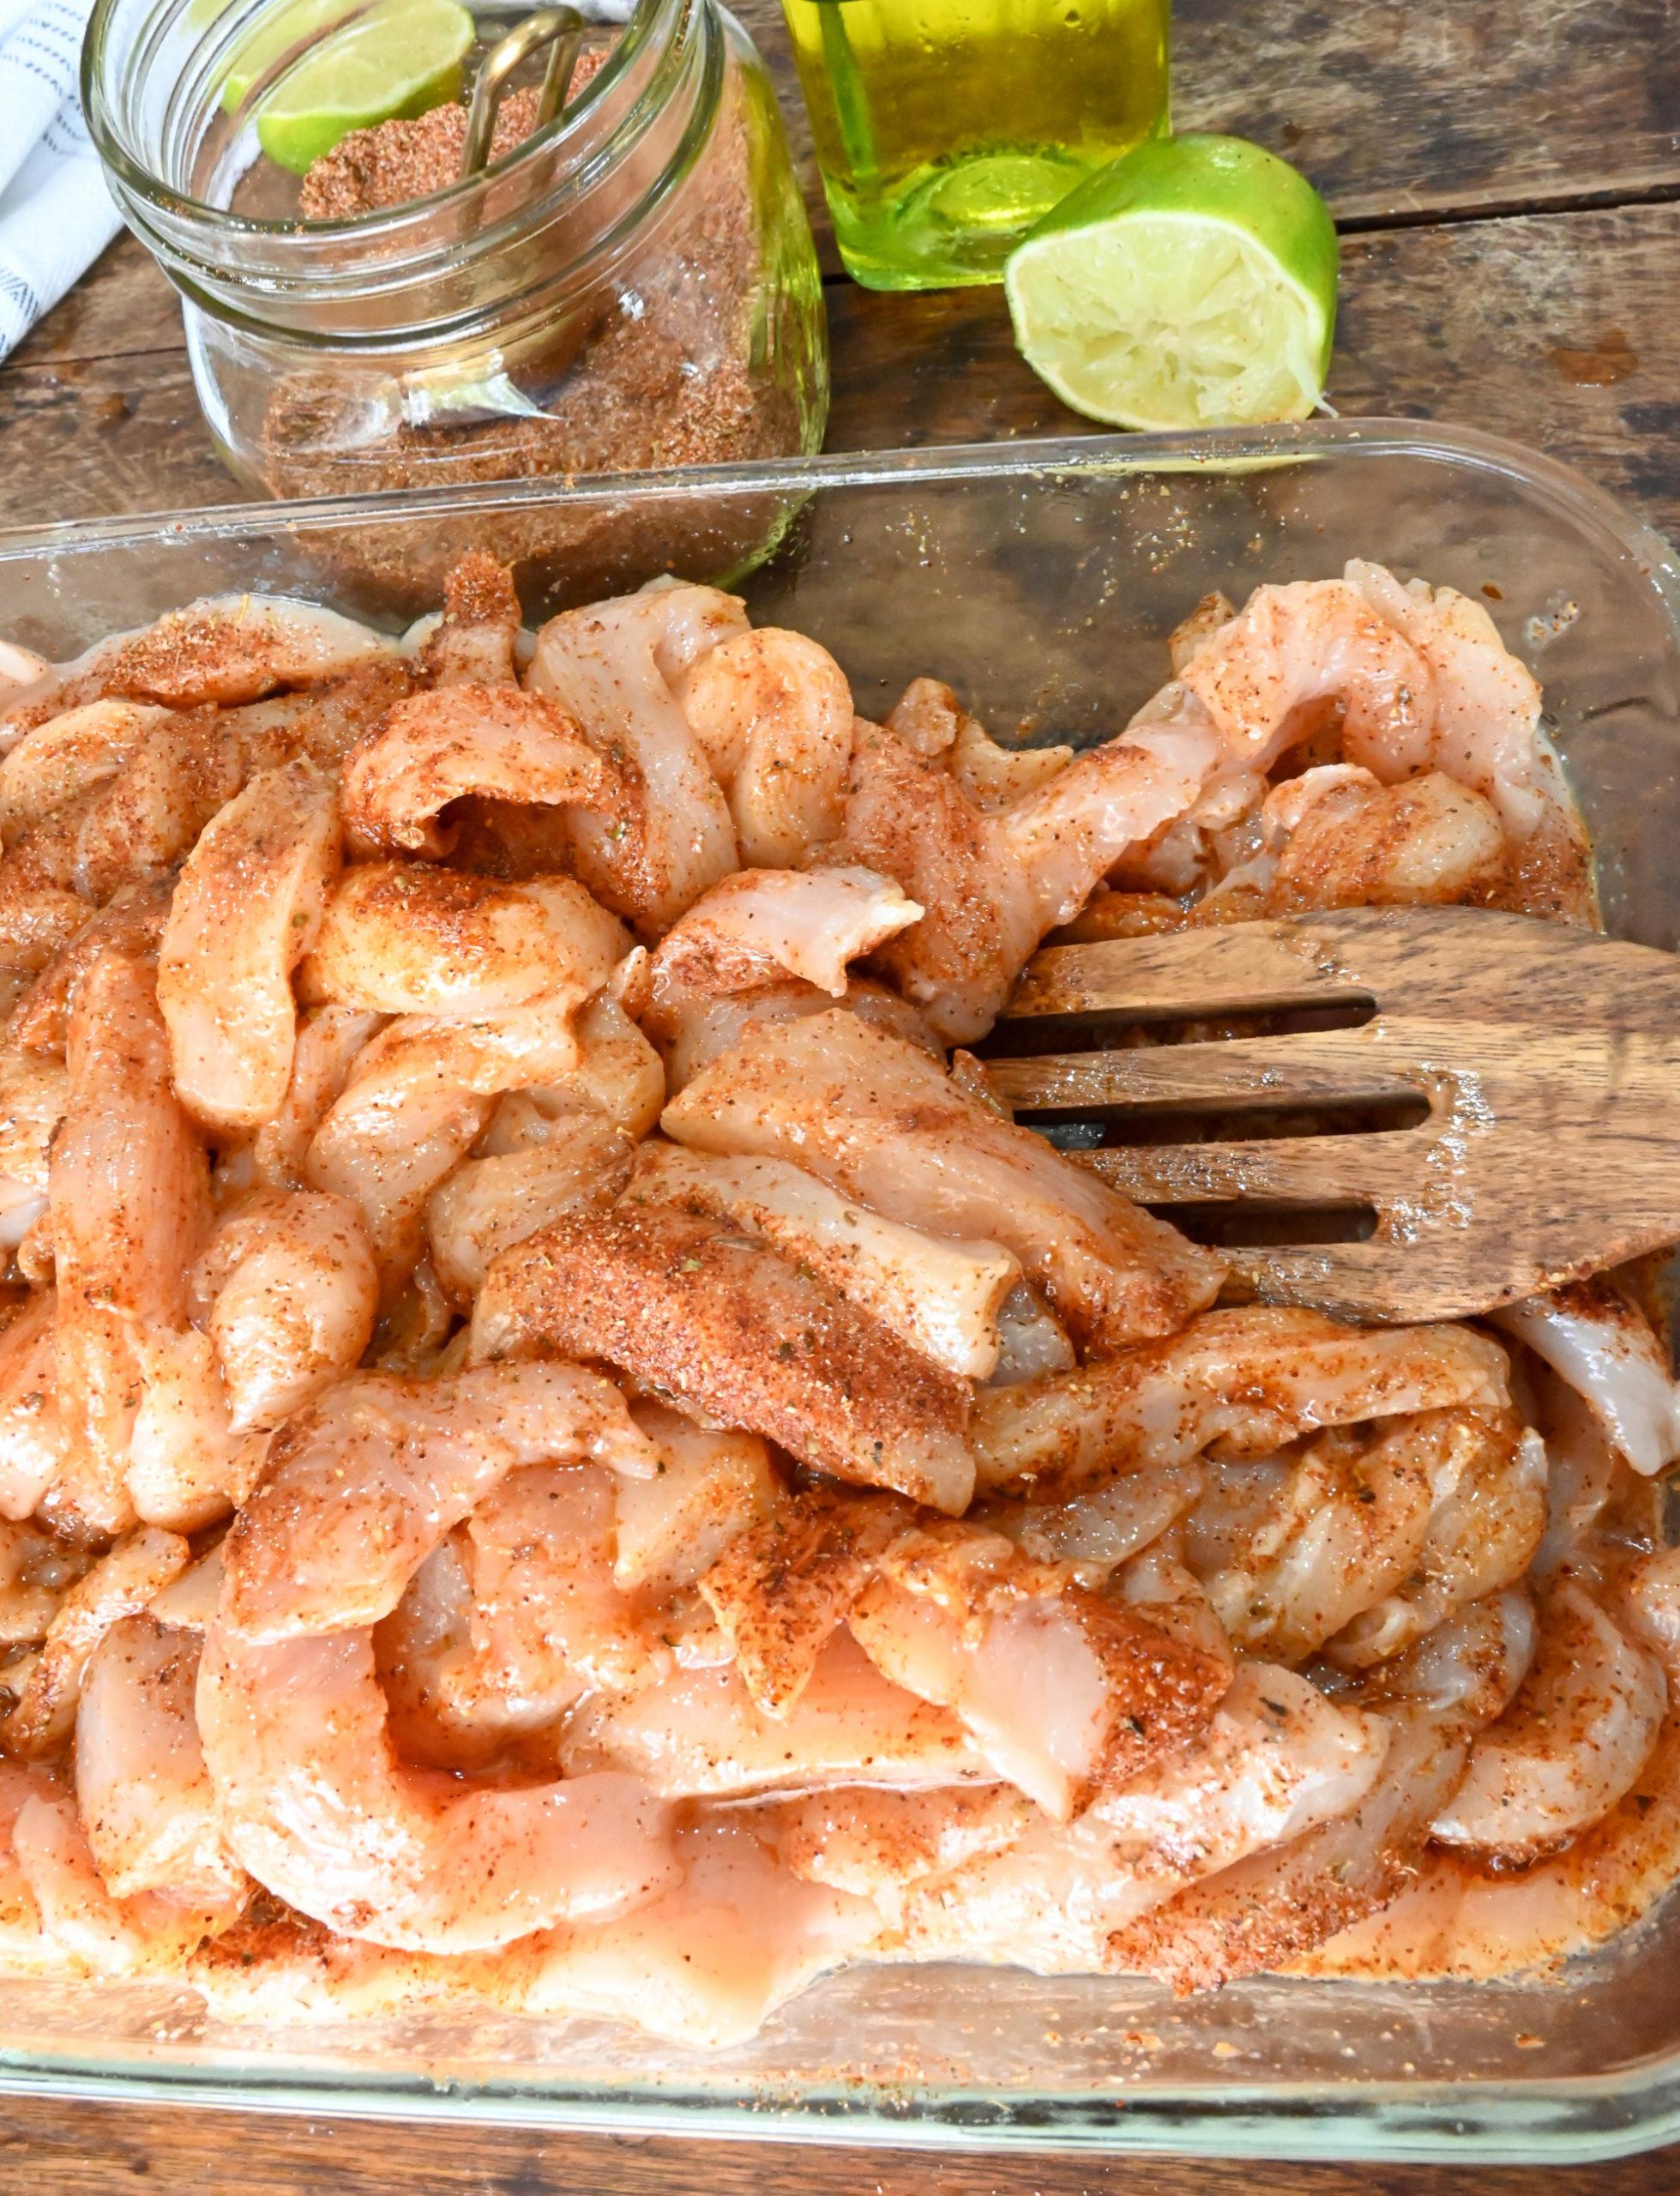 raw chicken being seasoned by keto fajita seasoning